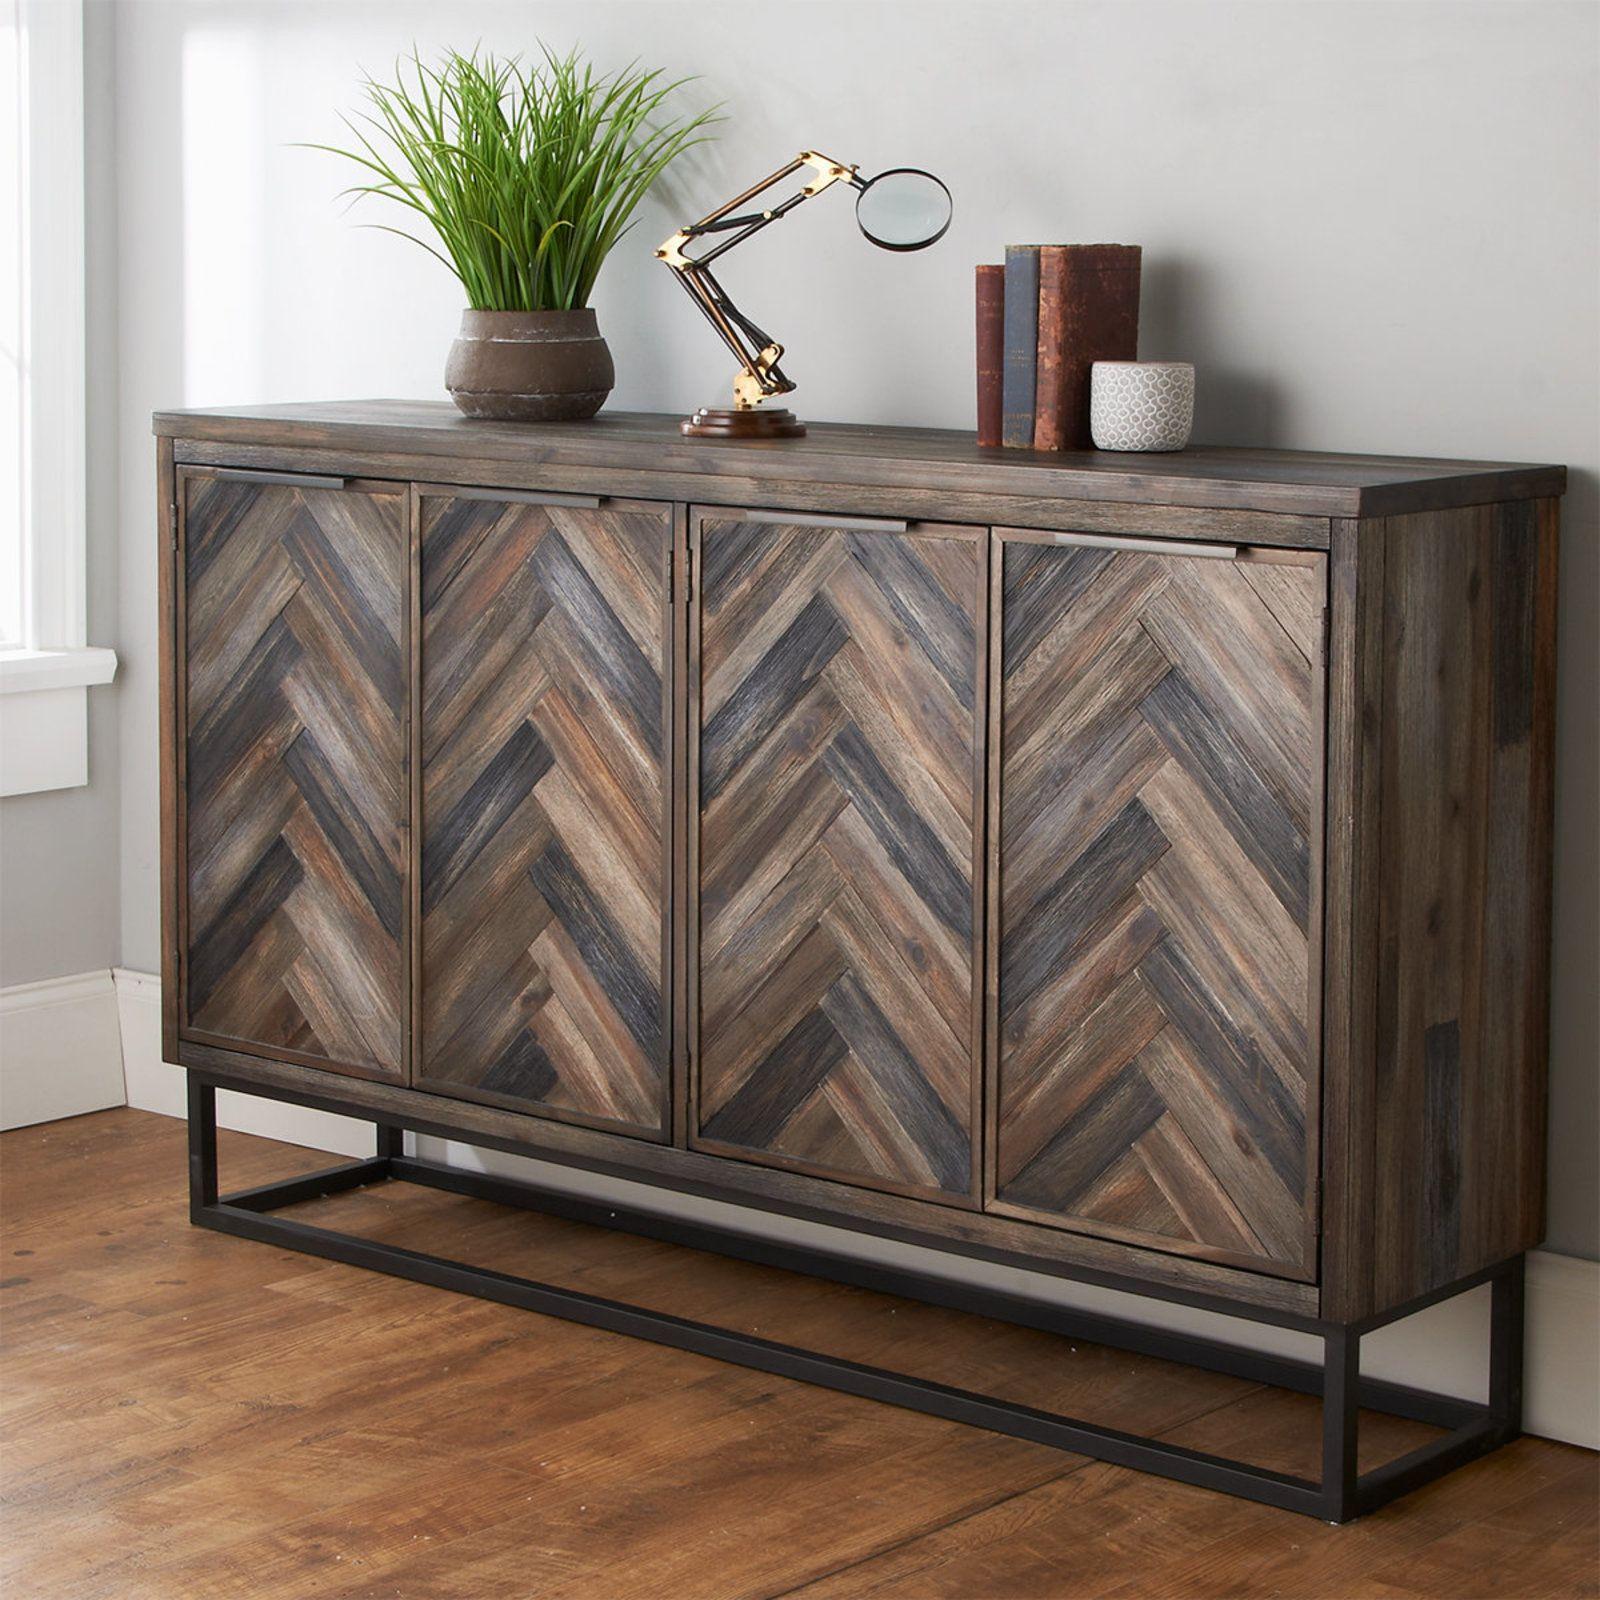 Alpine Modern Buffet Cabinet Modern Buffet Rustic Sideboard Rustic Furniture